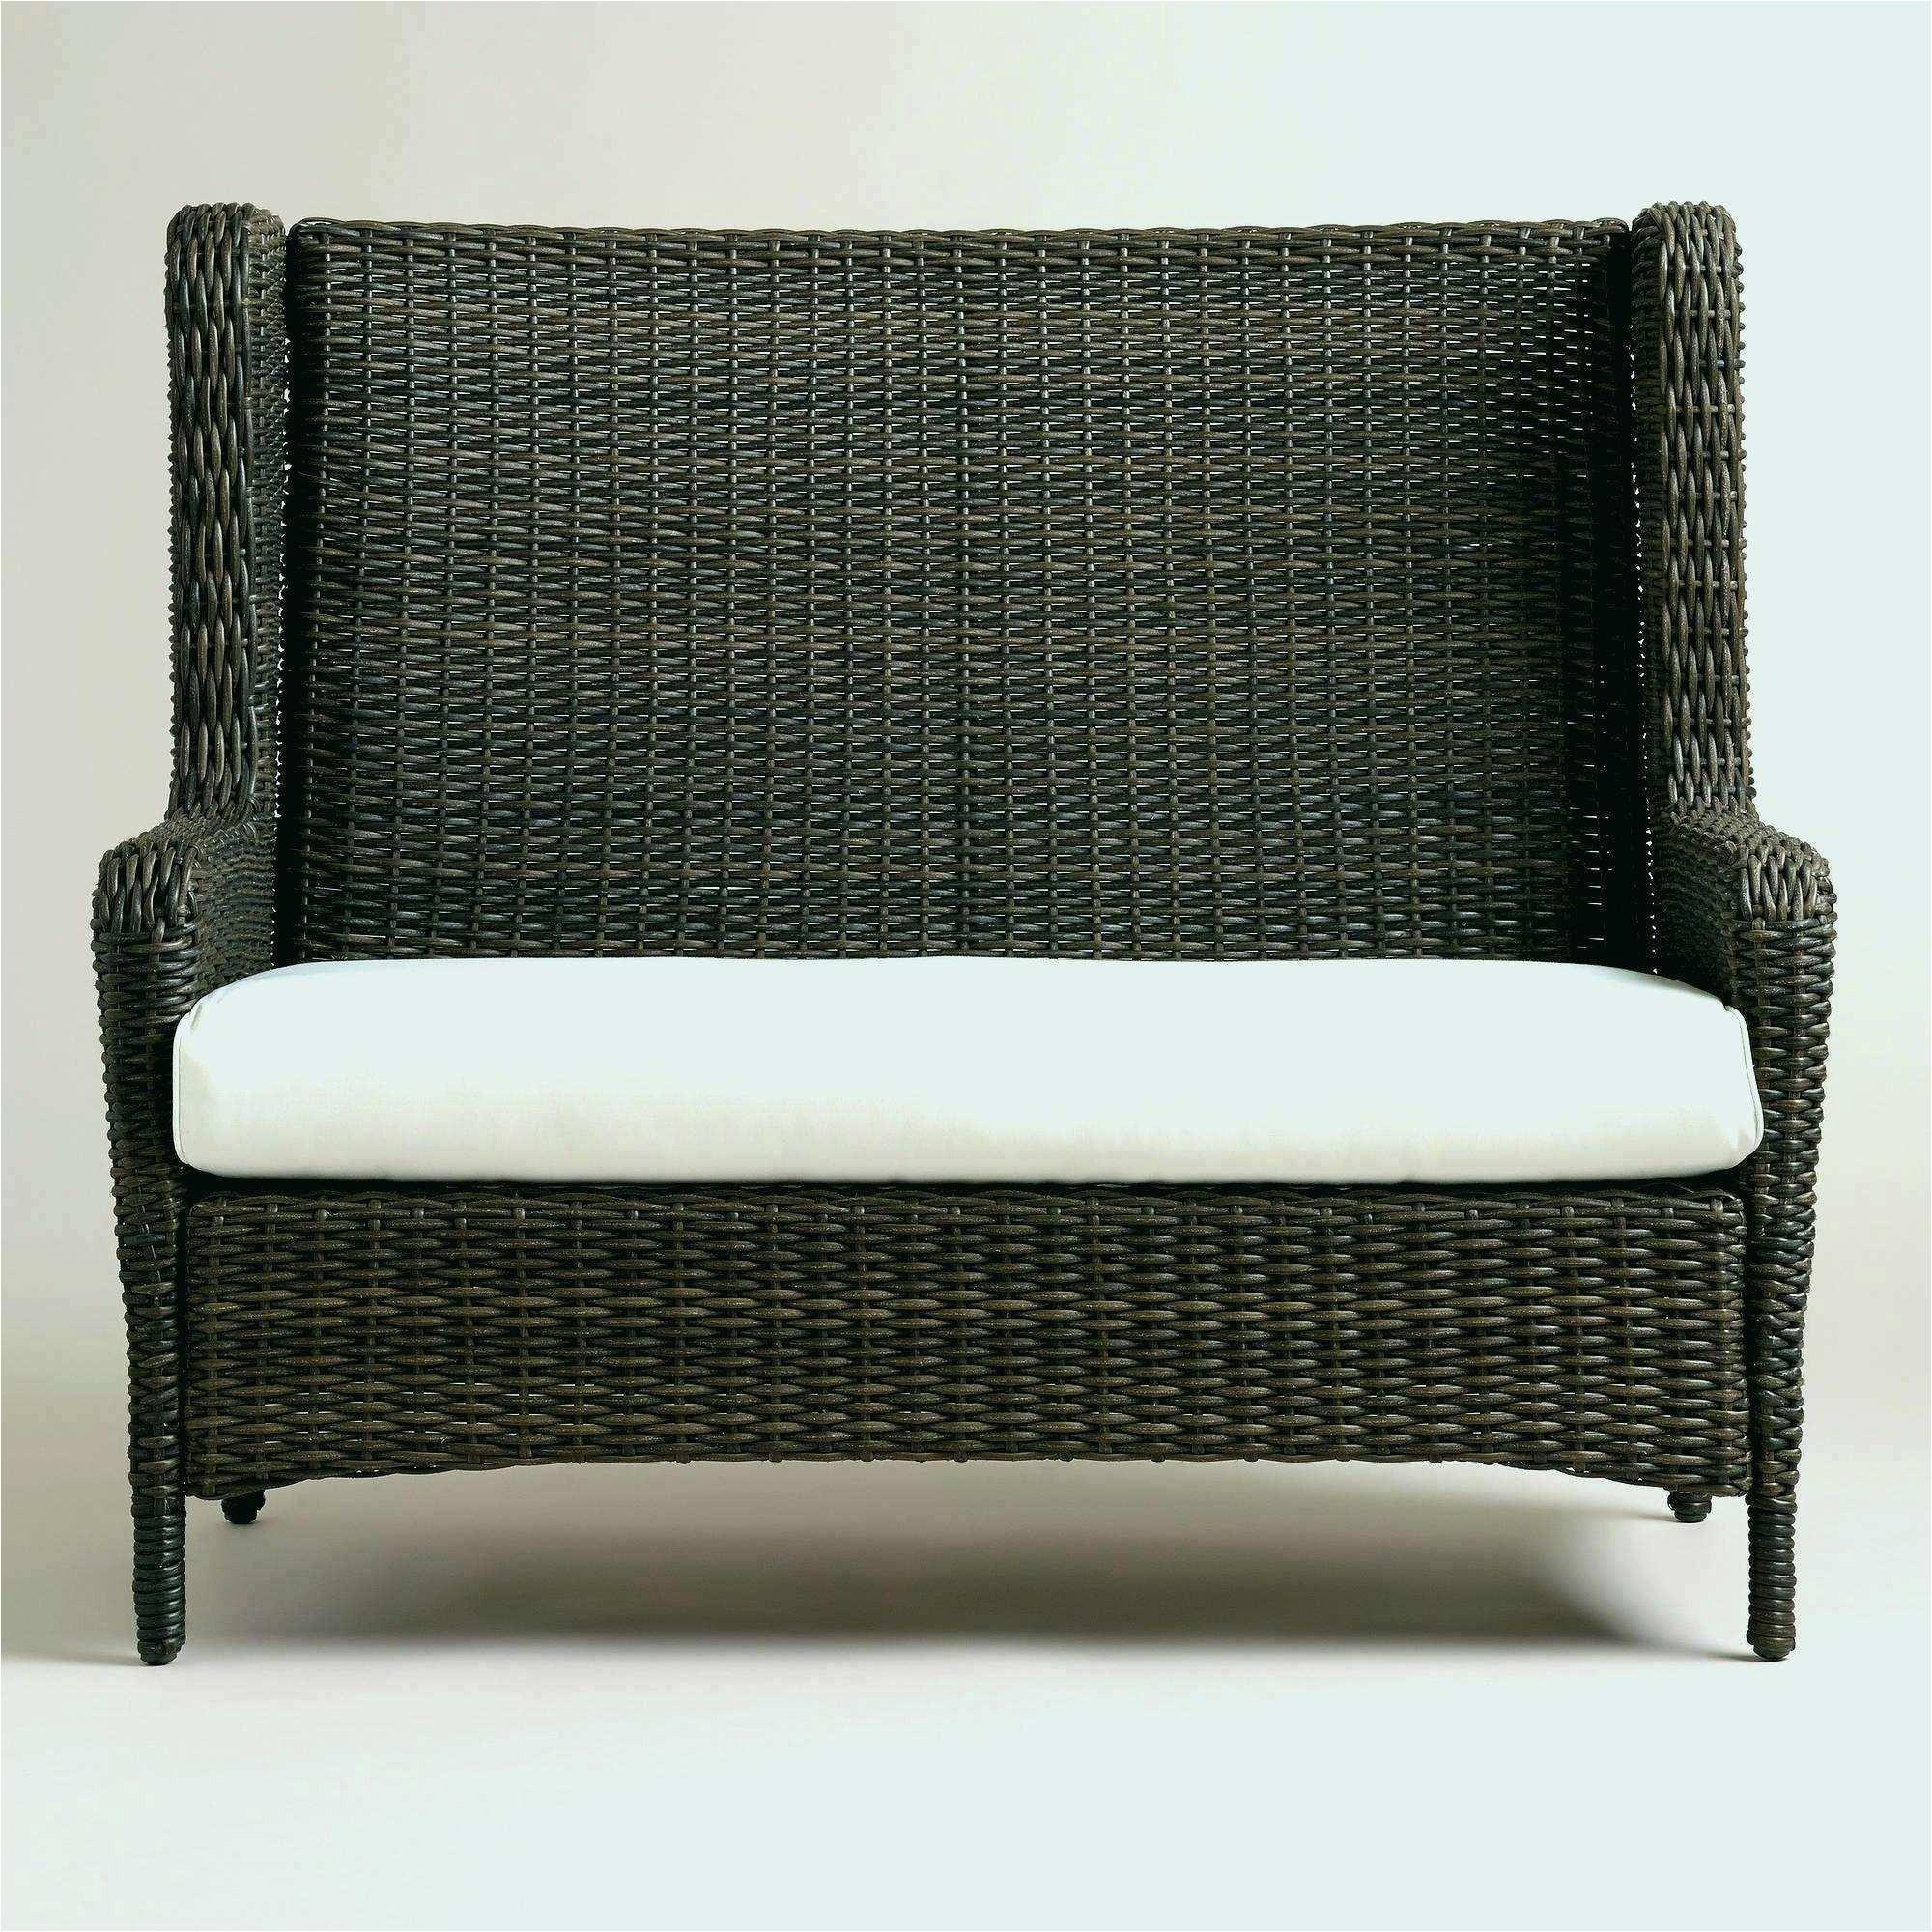 Corner sofa Gray sofa and Seats Beautiful Wicker Outdoor sofa 0d Patio Chairs Sale